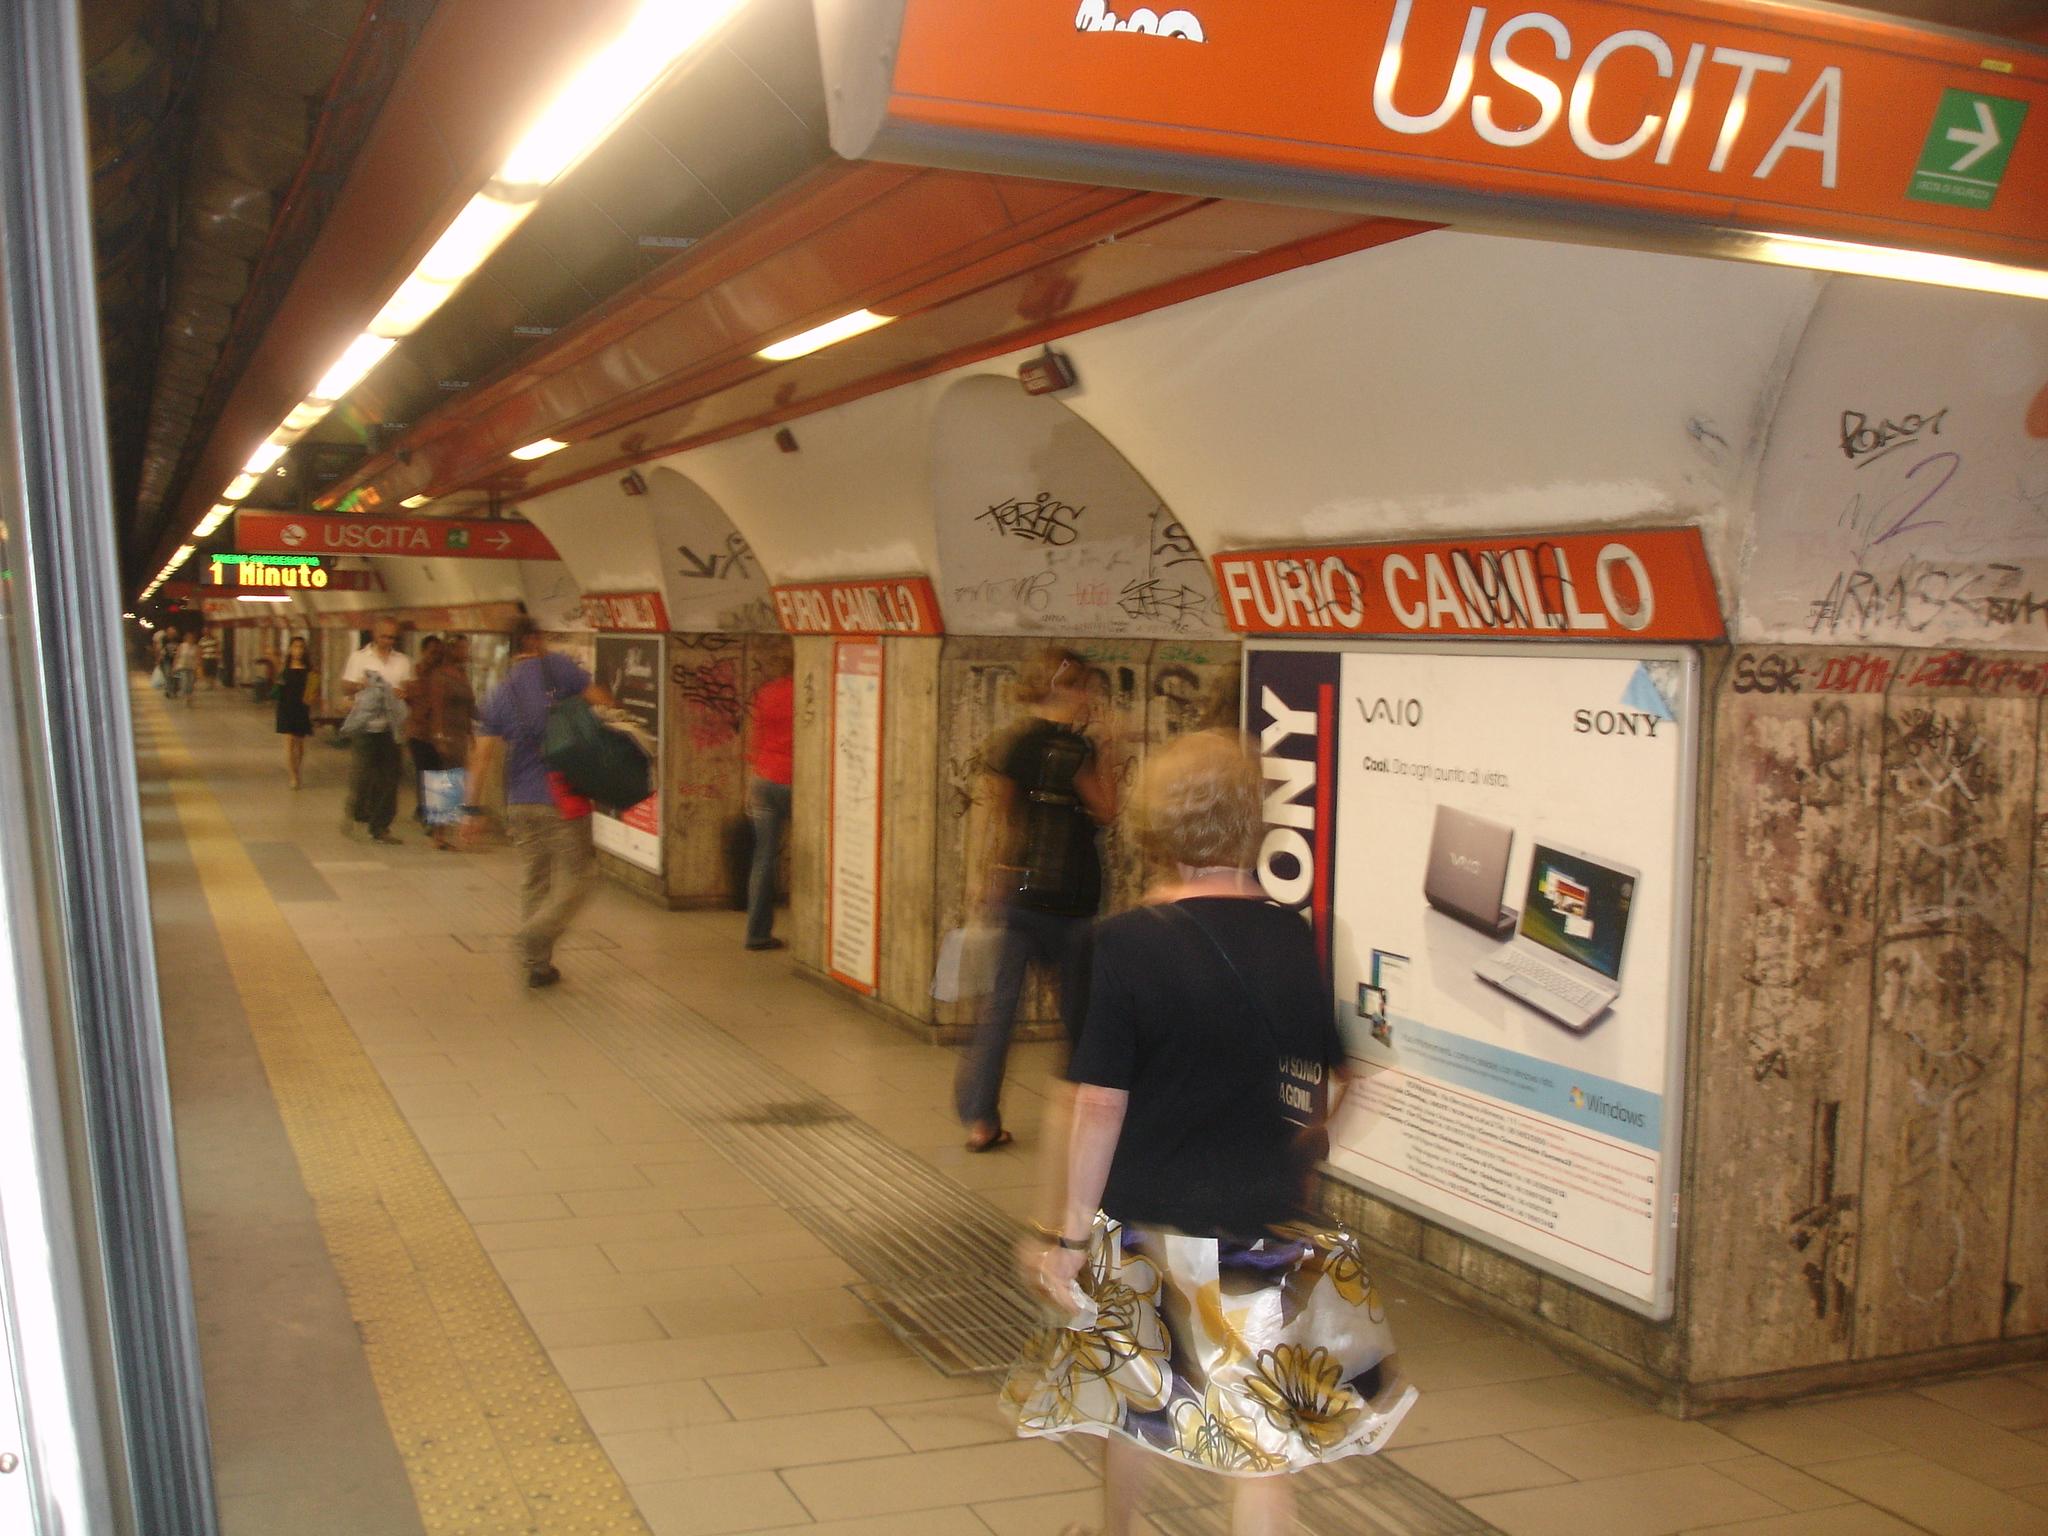 Furio_Camillo-Metropolitana_di_Roma